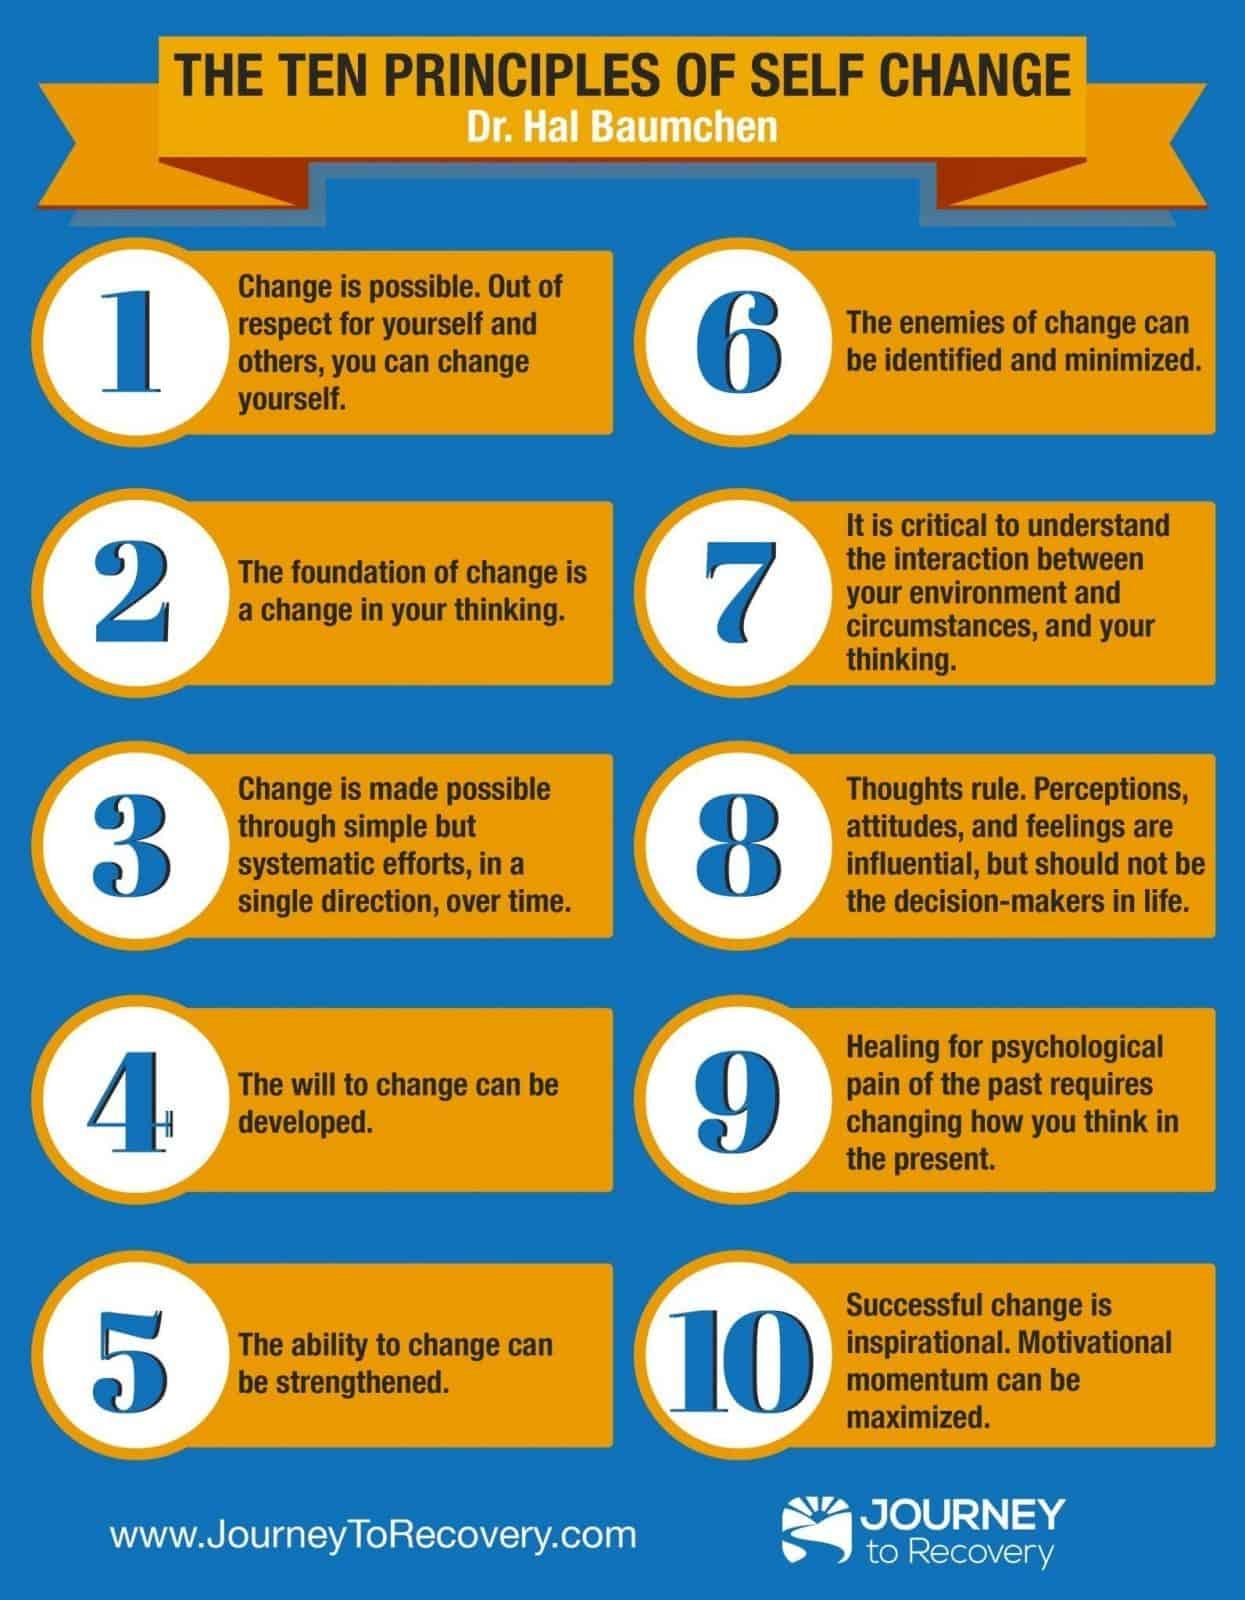 The Ten Principles of Self-Change (Infographic)